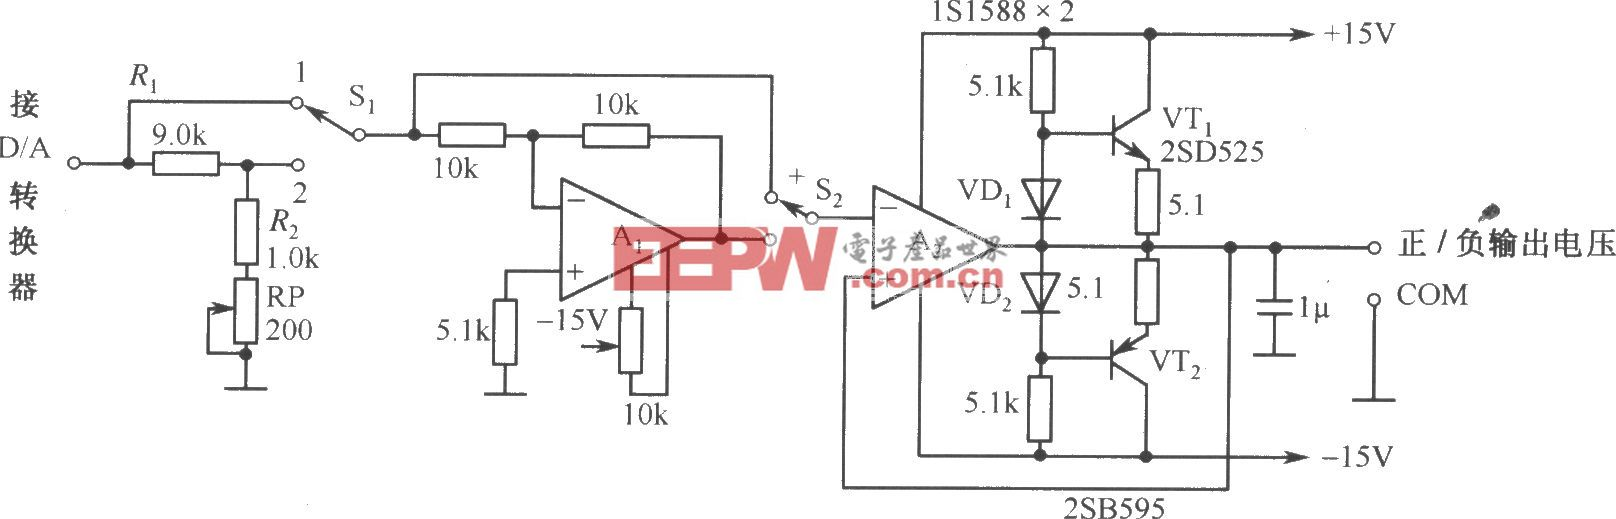 DAC-80-CCD-V構成的自動可逆控制的電源電路